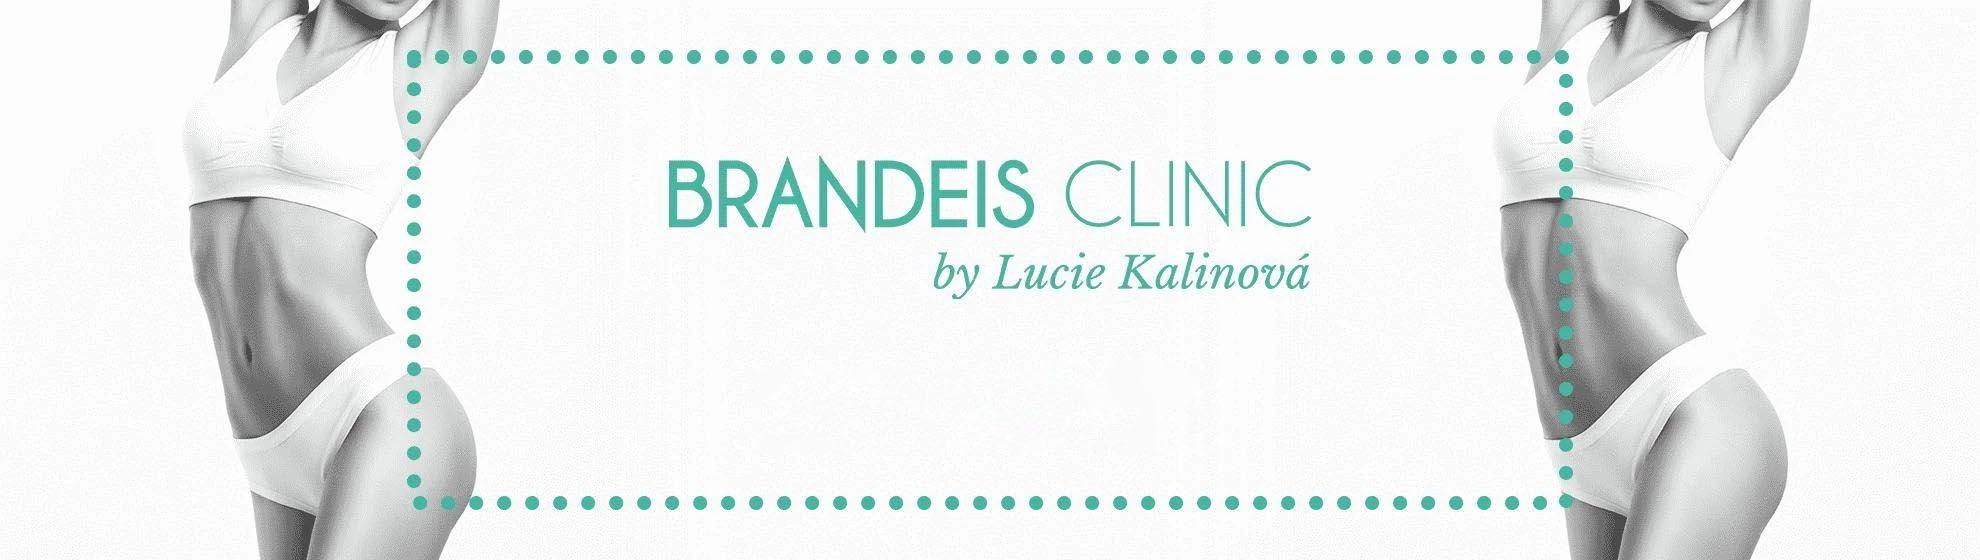 MUDr. Lucie Kalinová PhD.